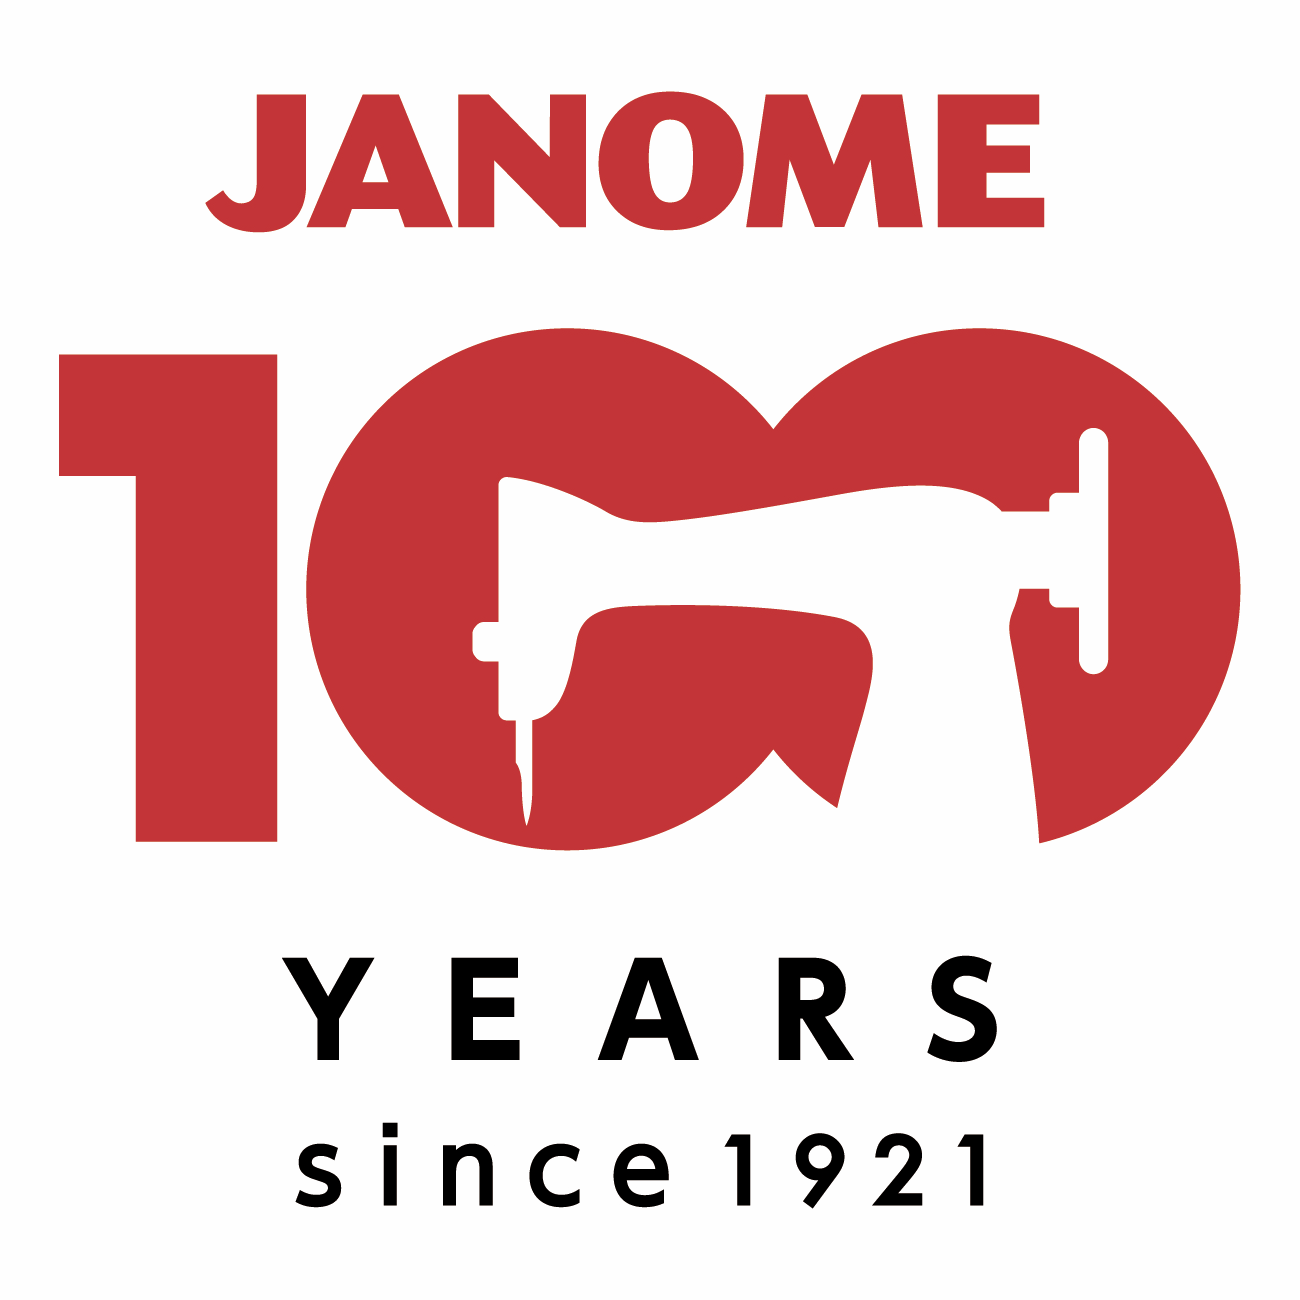 Janome naaimachnes 100 jaar